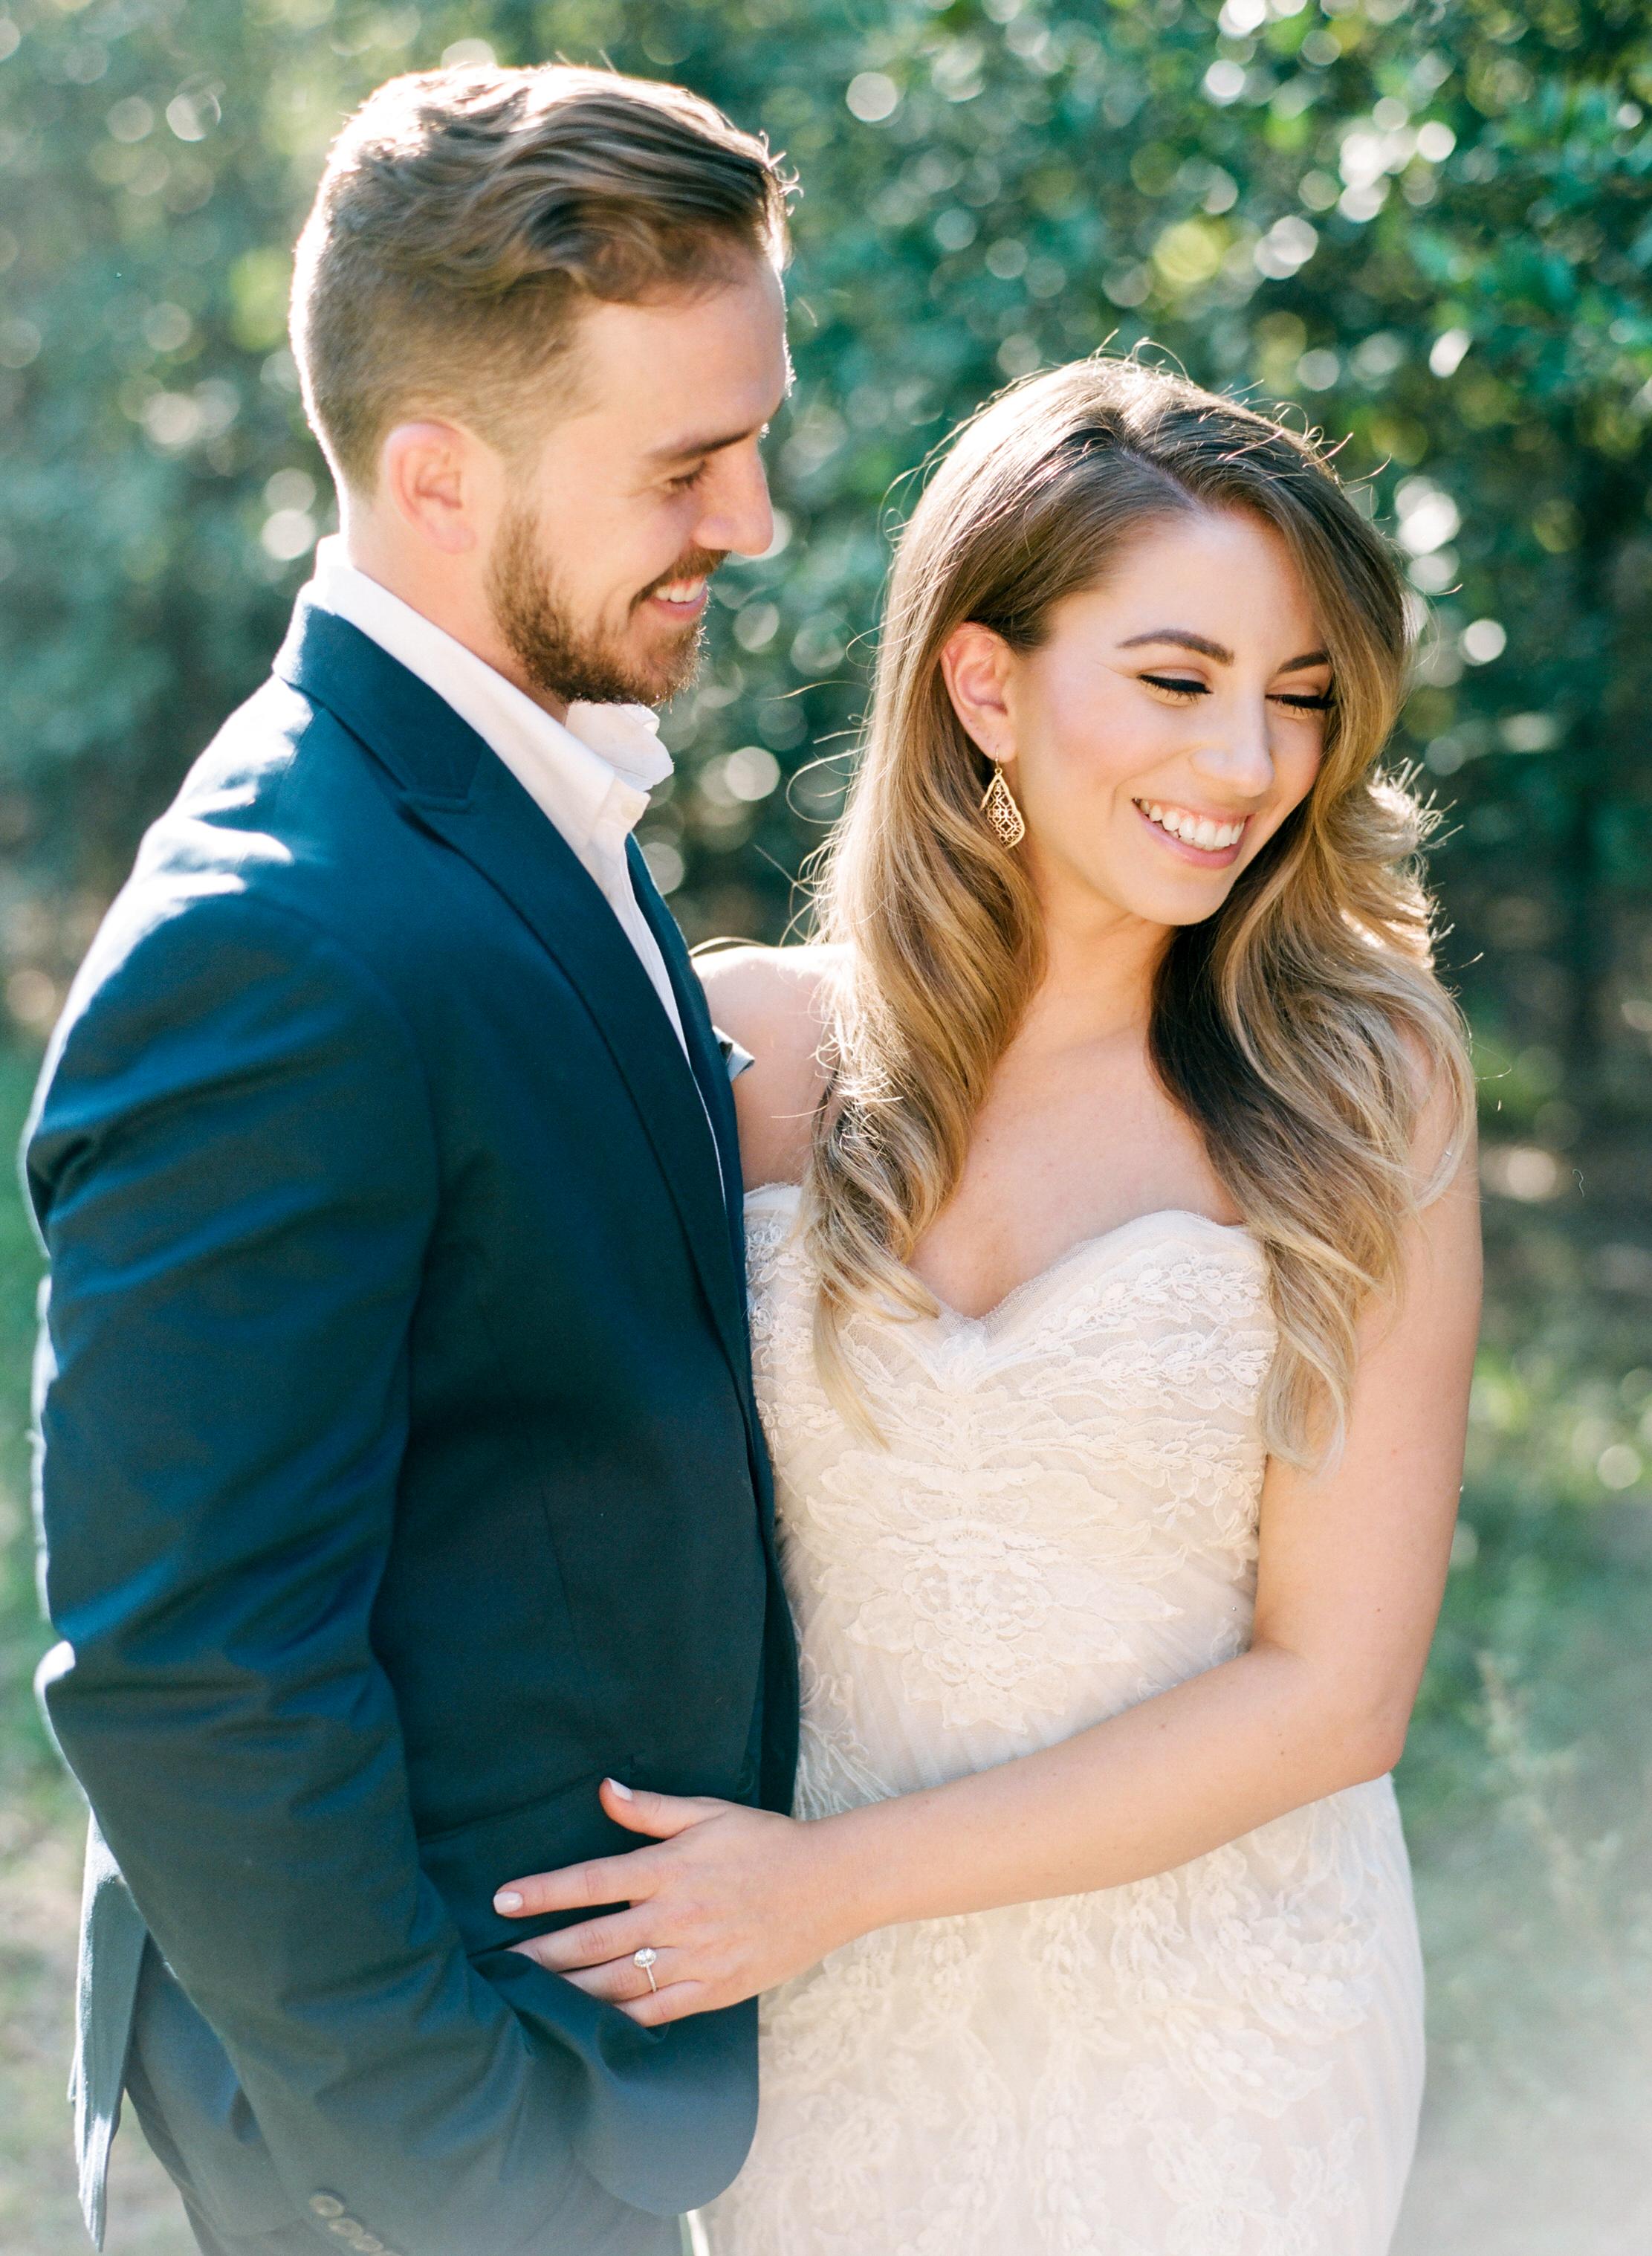 dana-fernandez-photography-the-wedding-chicks-film-houston-wedding-photography-destination-11.jpg